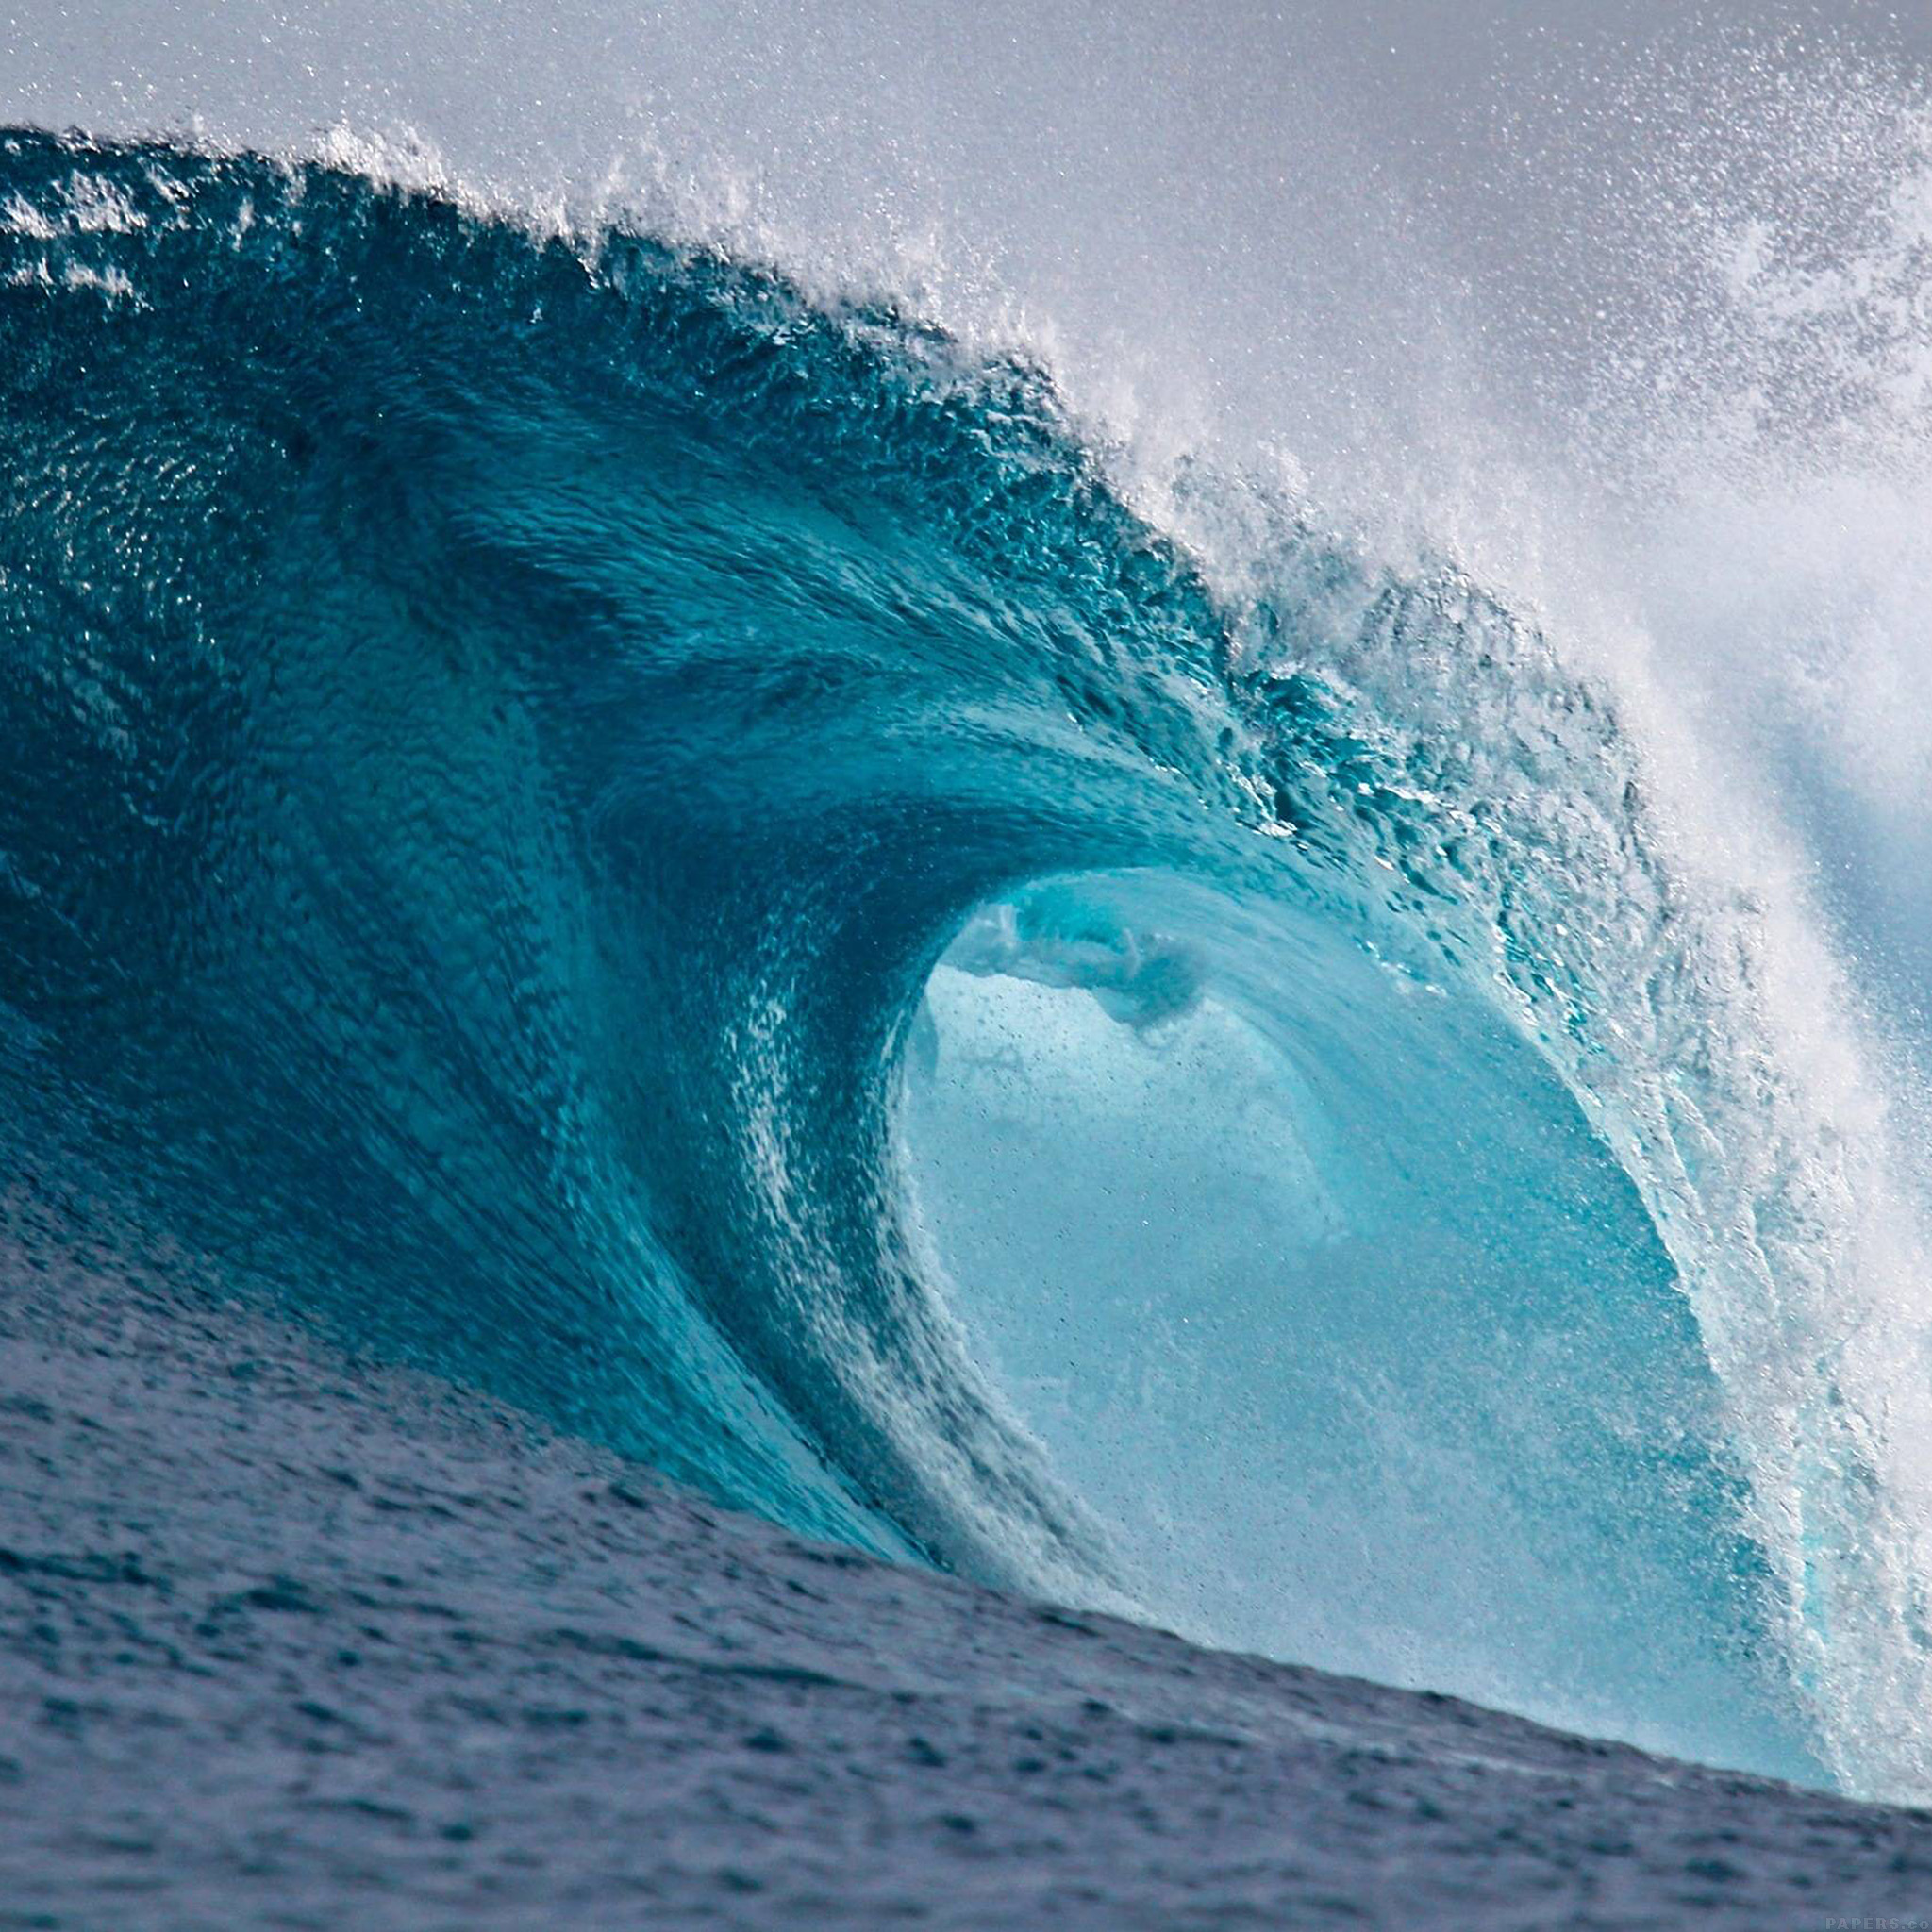 Mj35 Wave Surf Ocean Sea Beach Art Nature